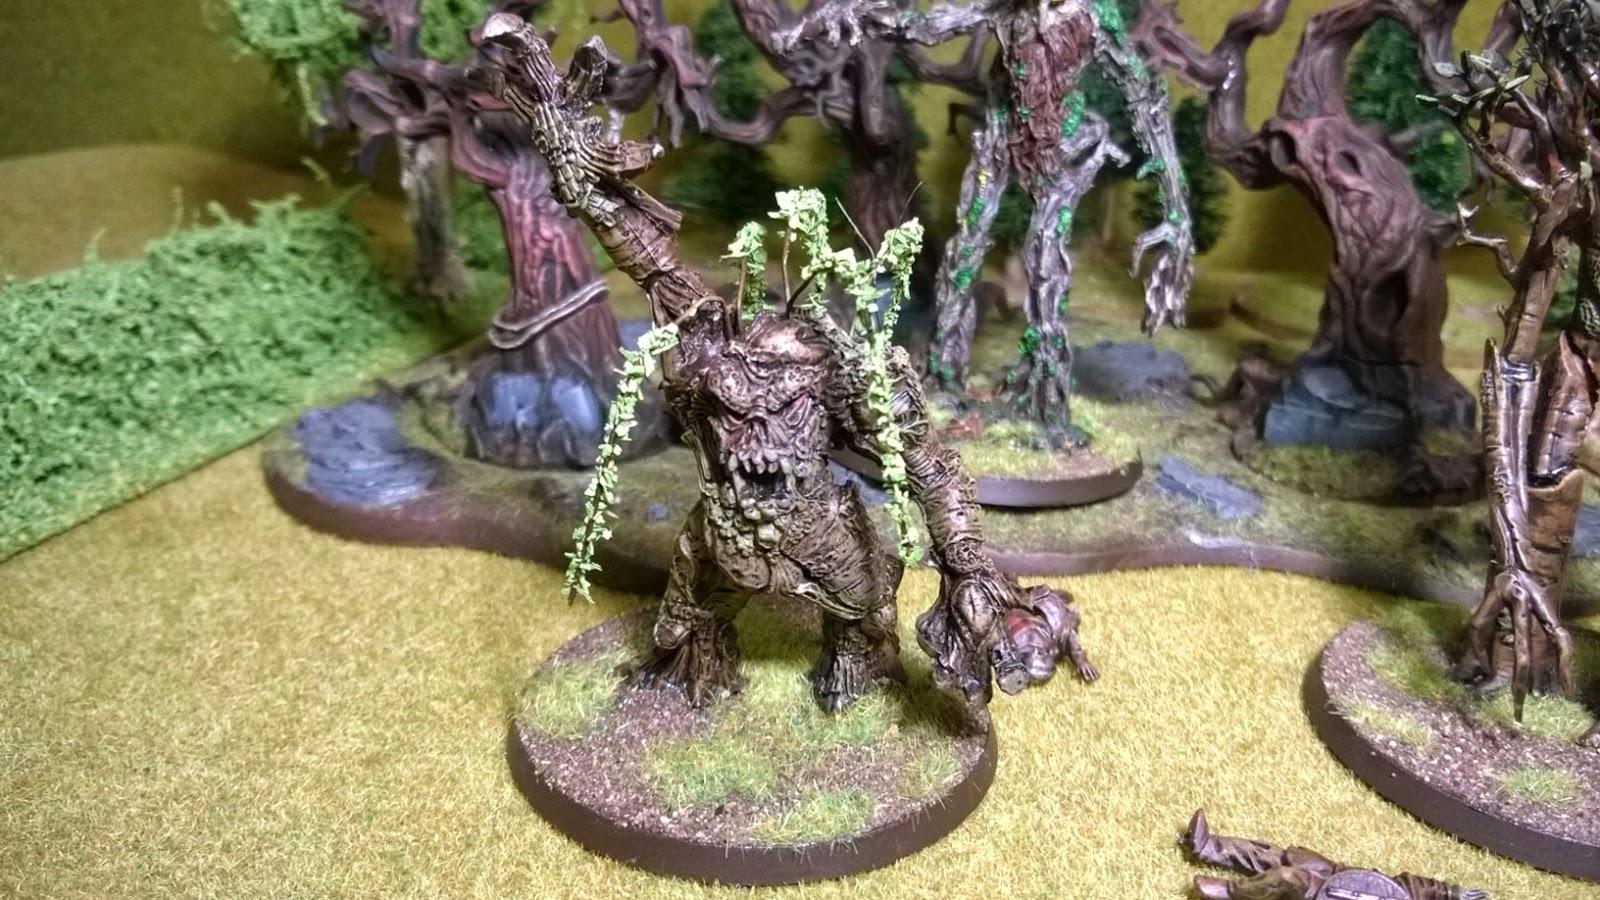 converted lotr ent warhammer fantasy treeman oop metal willow